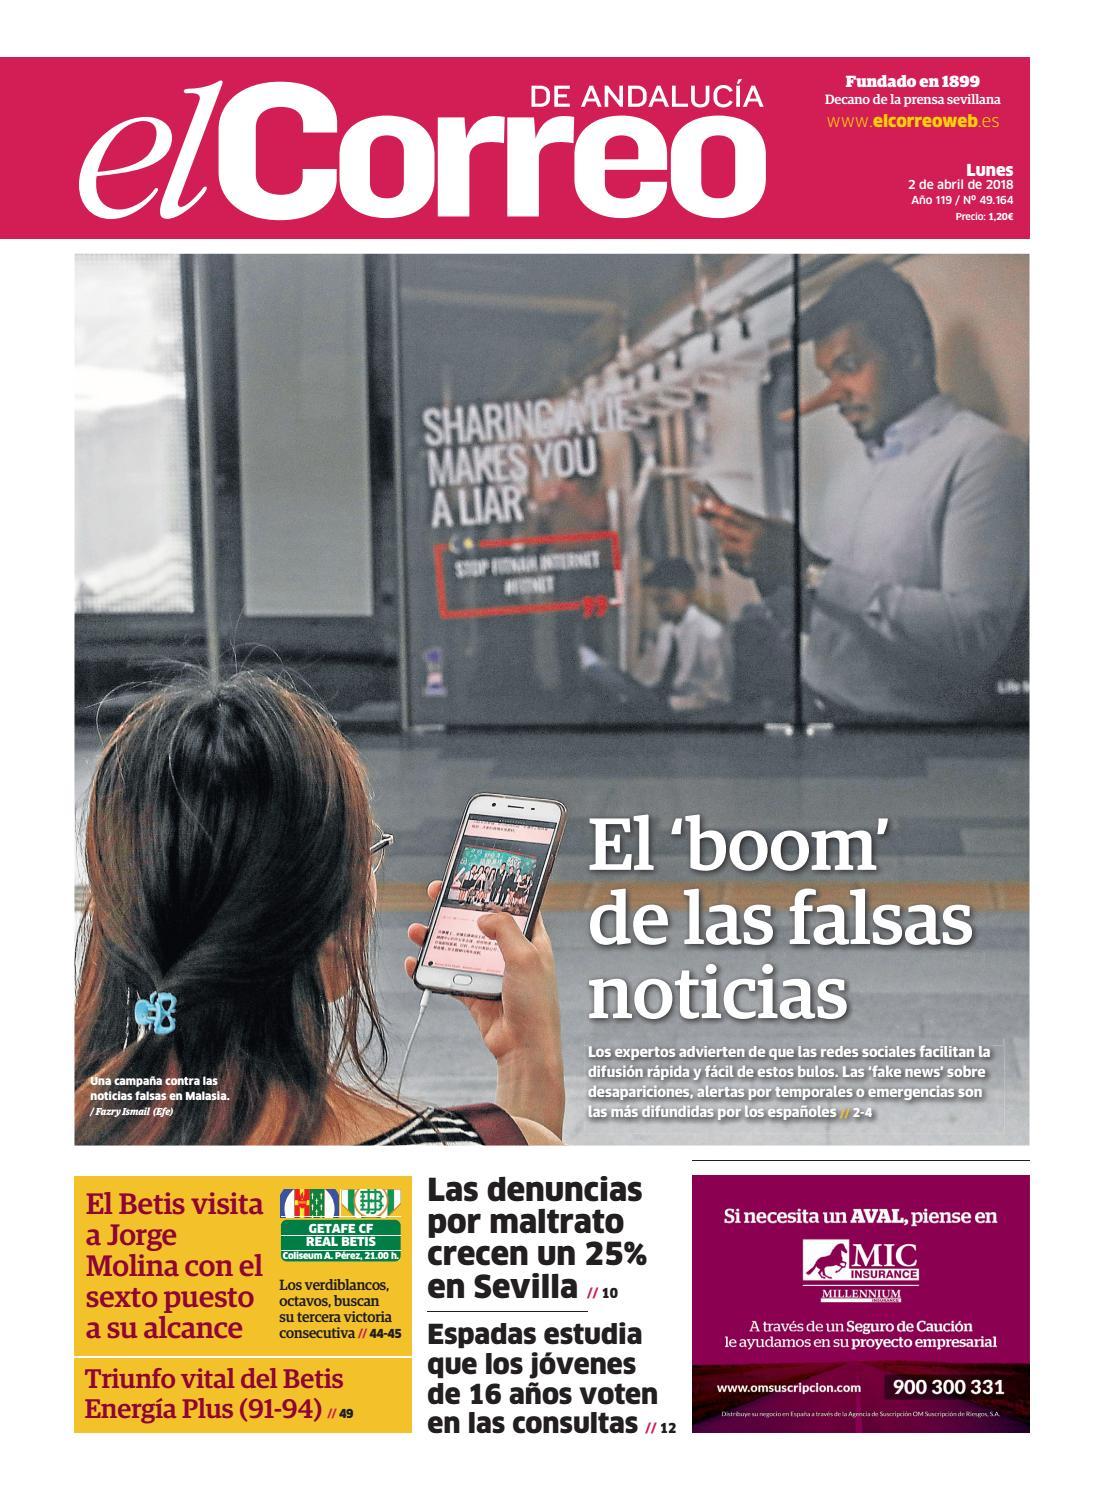 c8e8f0195 02.04.2018 El Correo de Andalucía by EL CORREO DE ANDALUCÍA S.L. - issuu